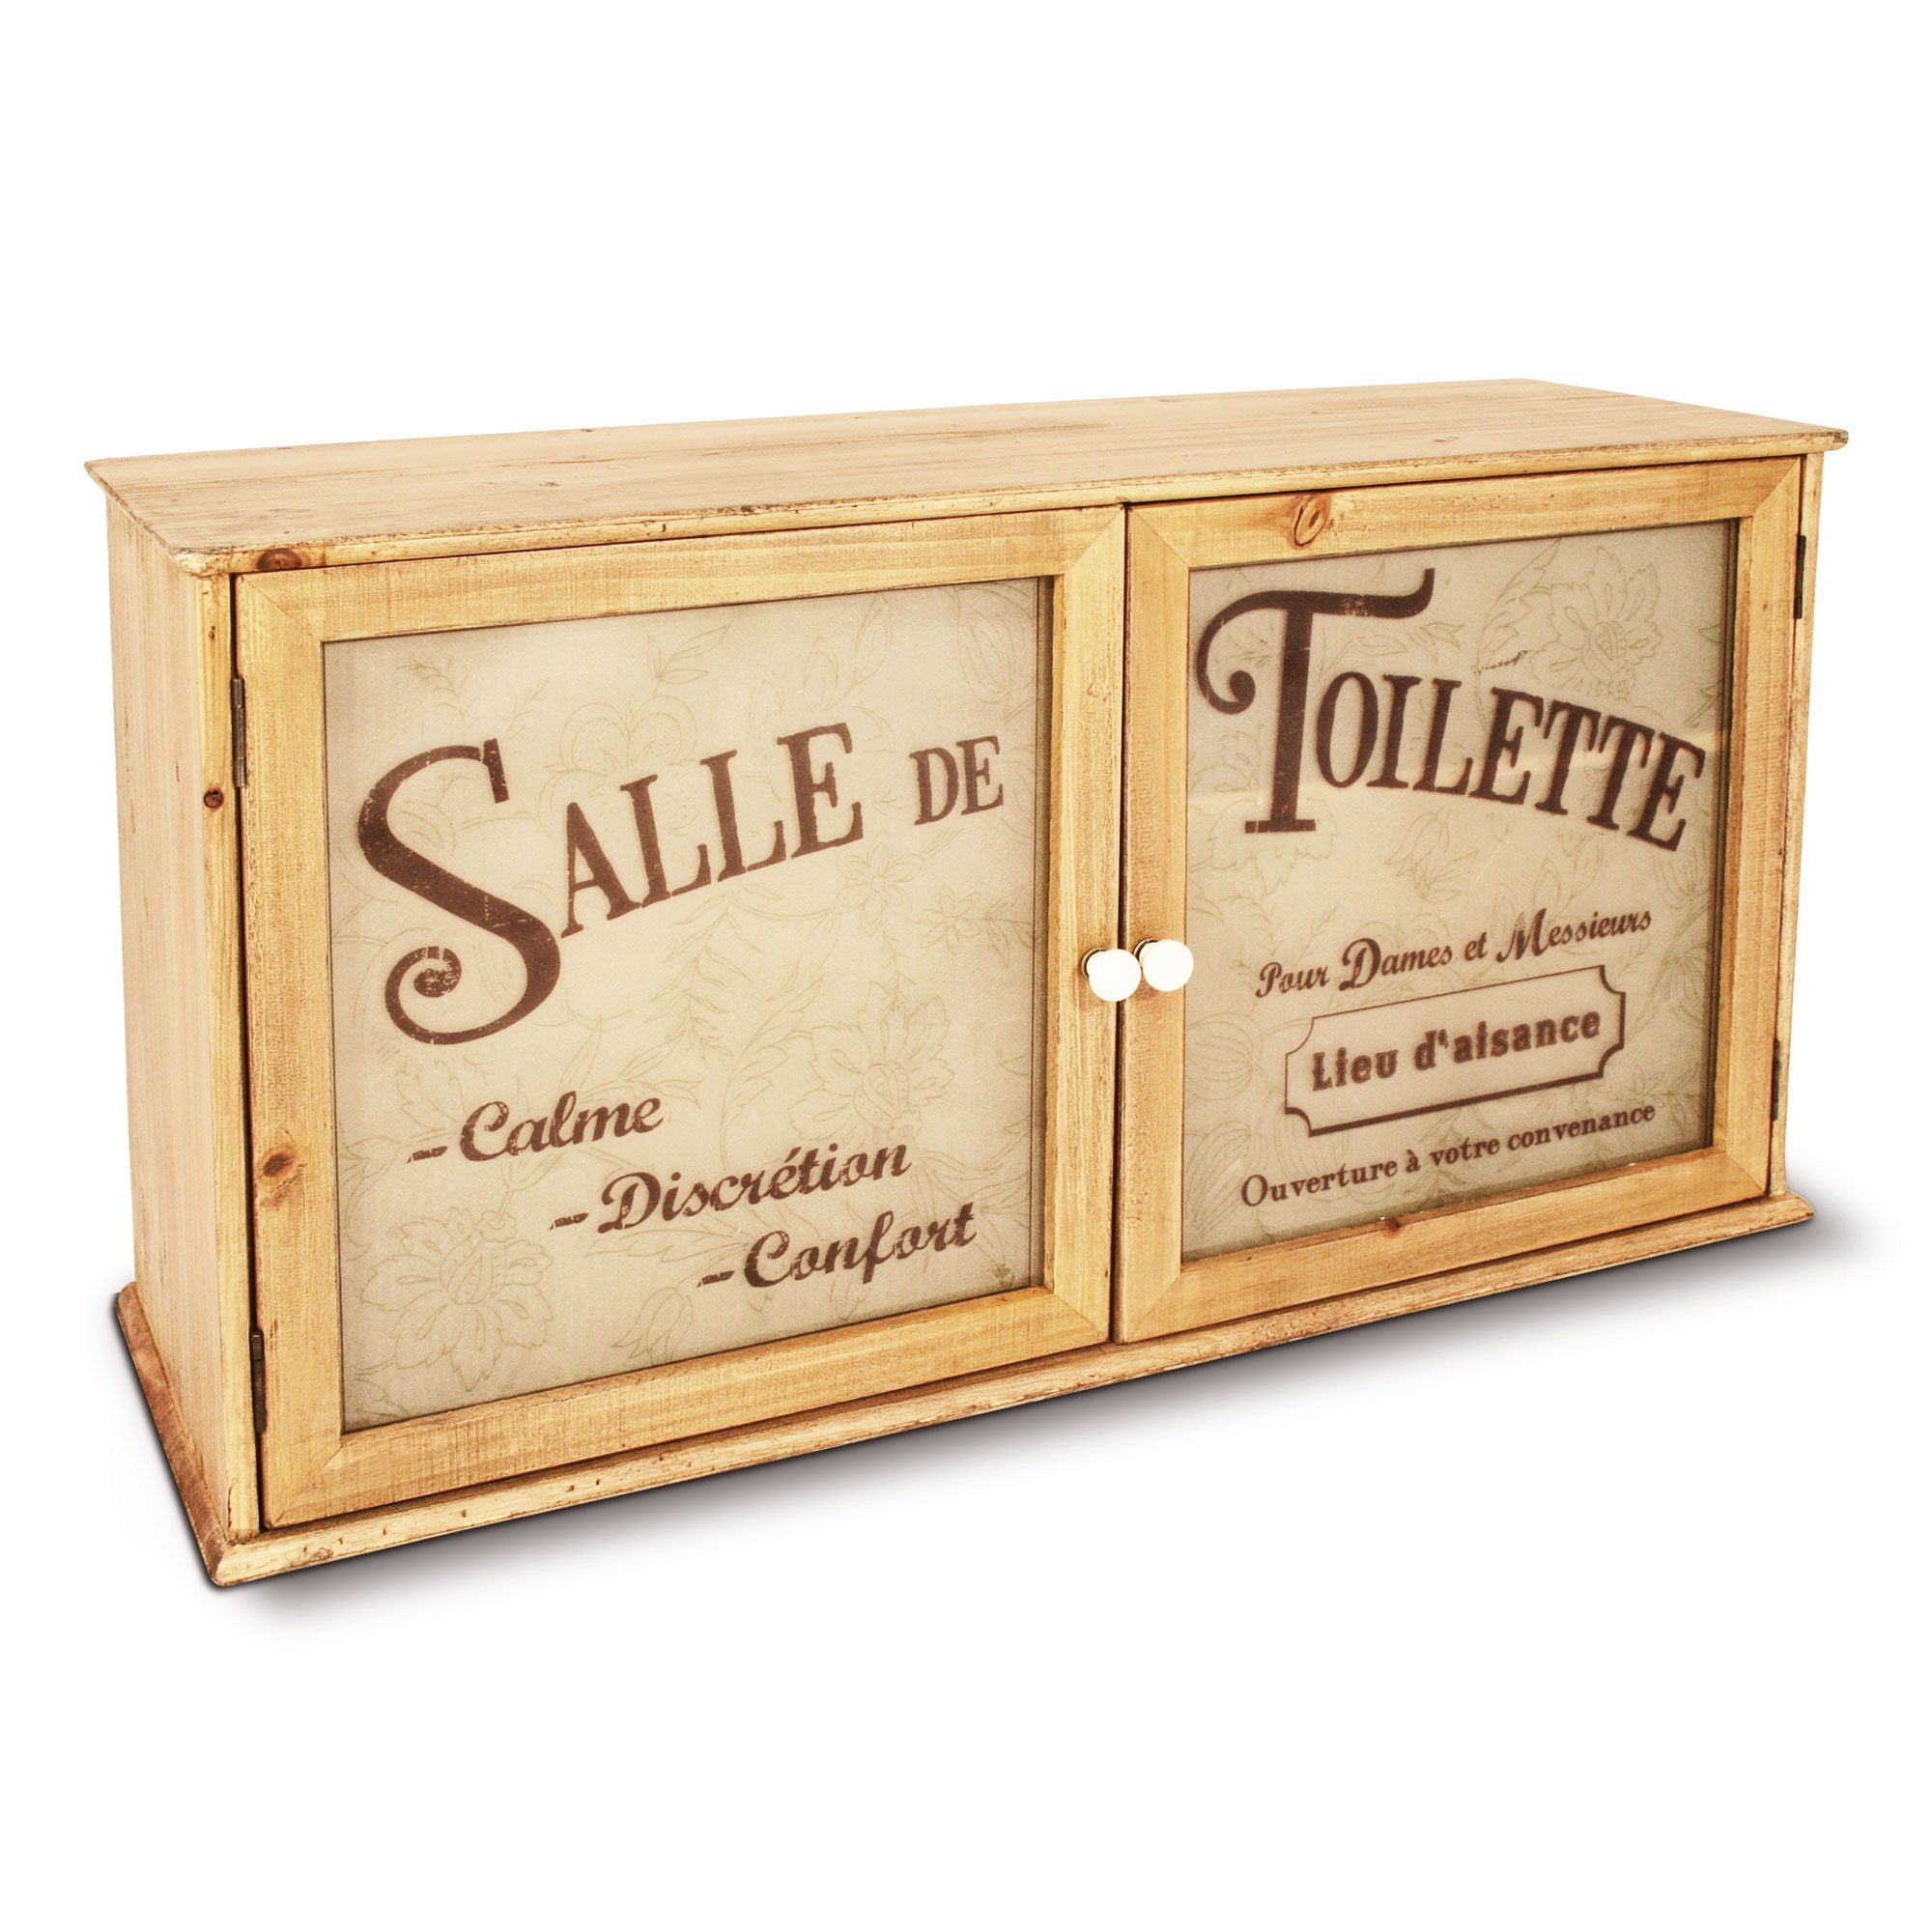 Meuble wc en bois 2 portes salle de toilette baln o natives prix promo delama - Meubles salle de bain bois pas cher ...